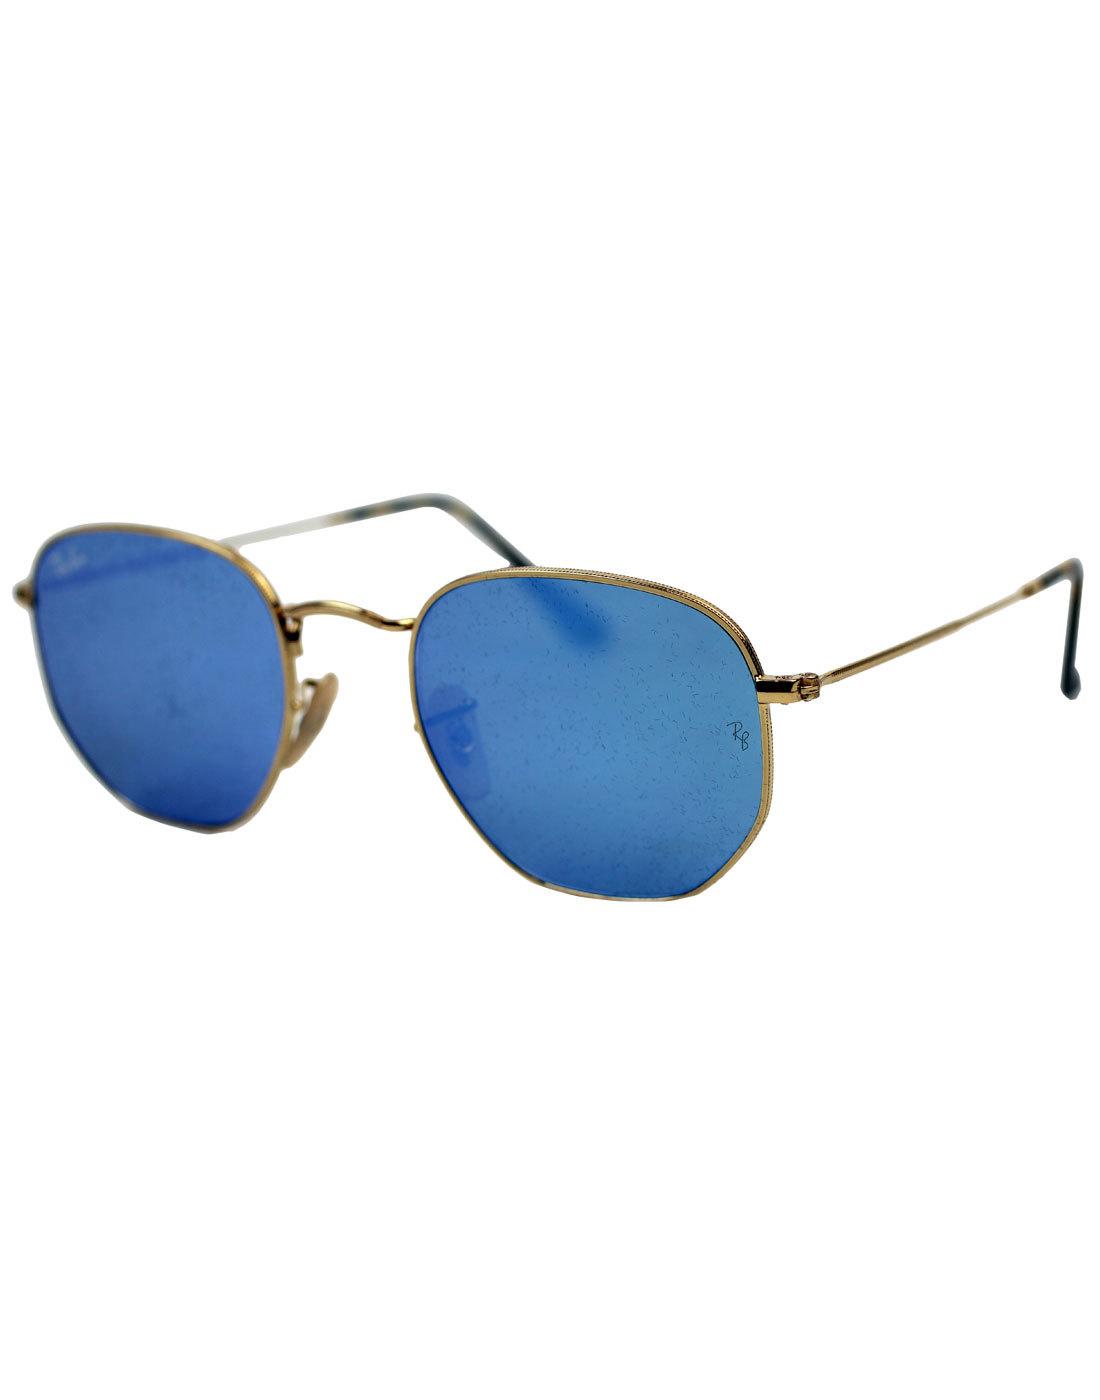 Hexagonal Round RAY-BAN Mod Blue Flash Sunglasses